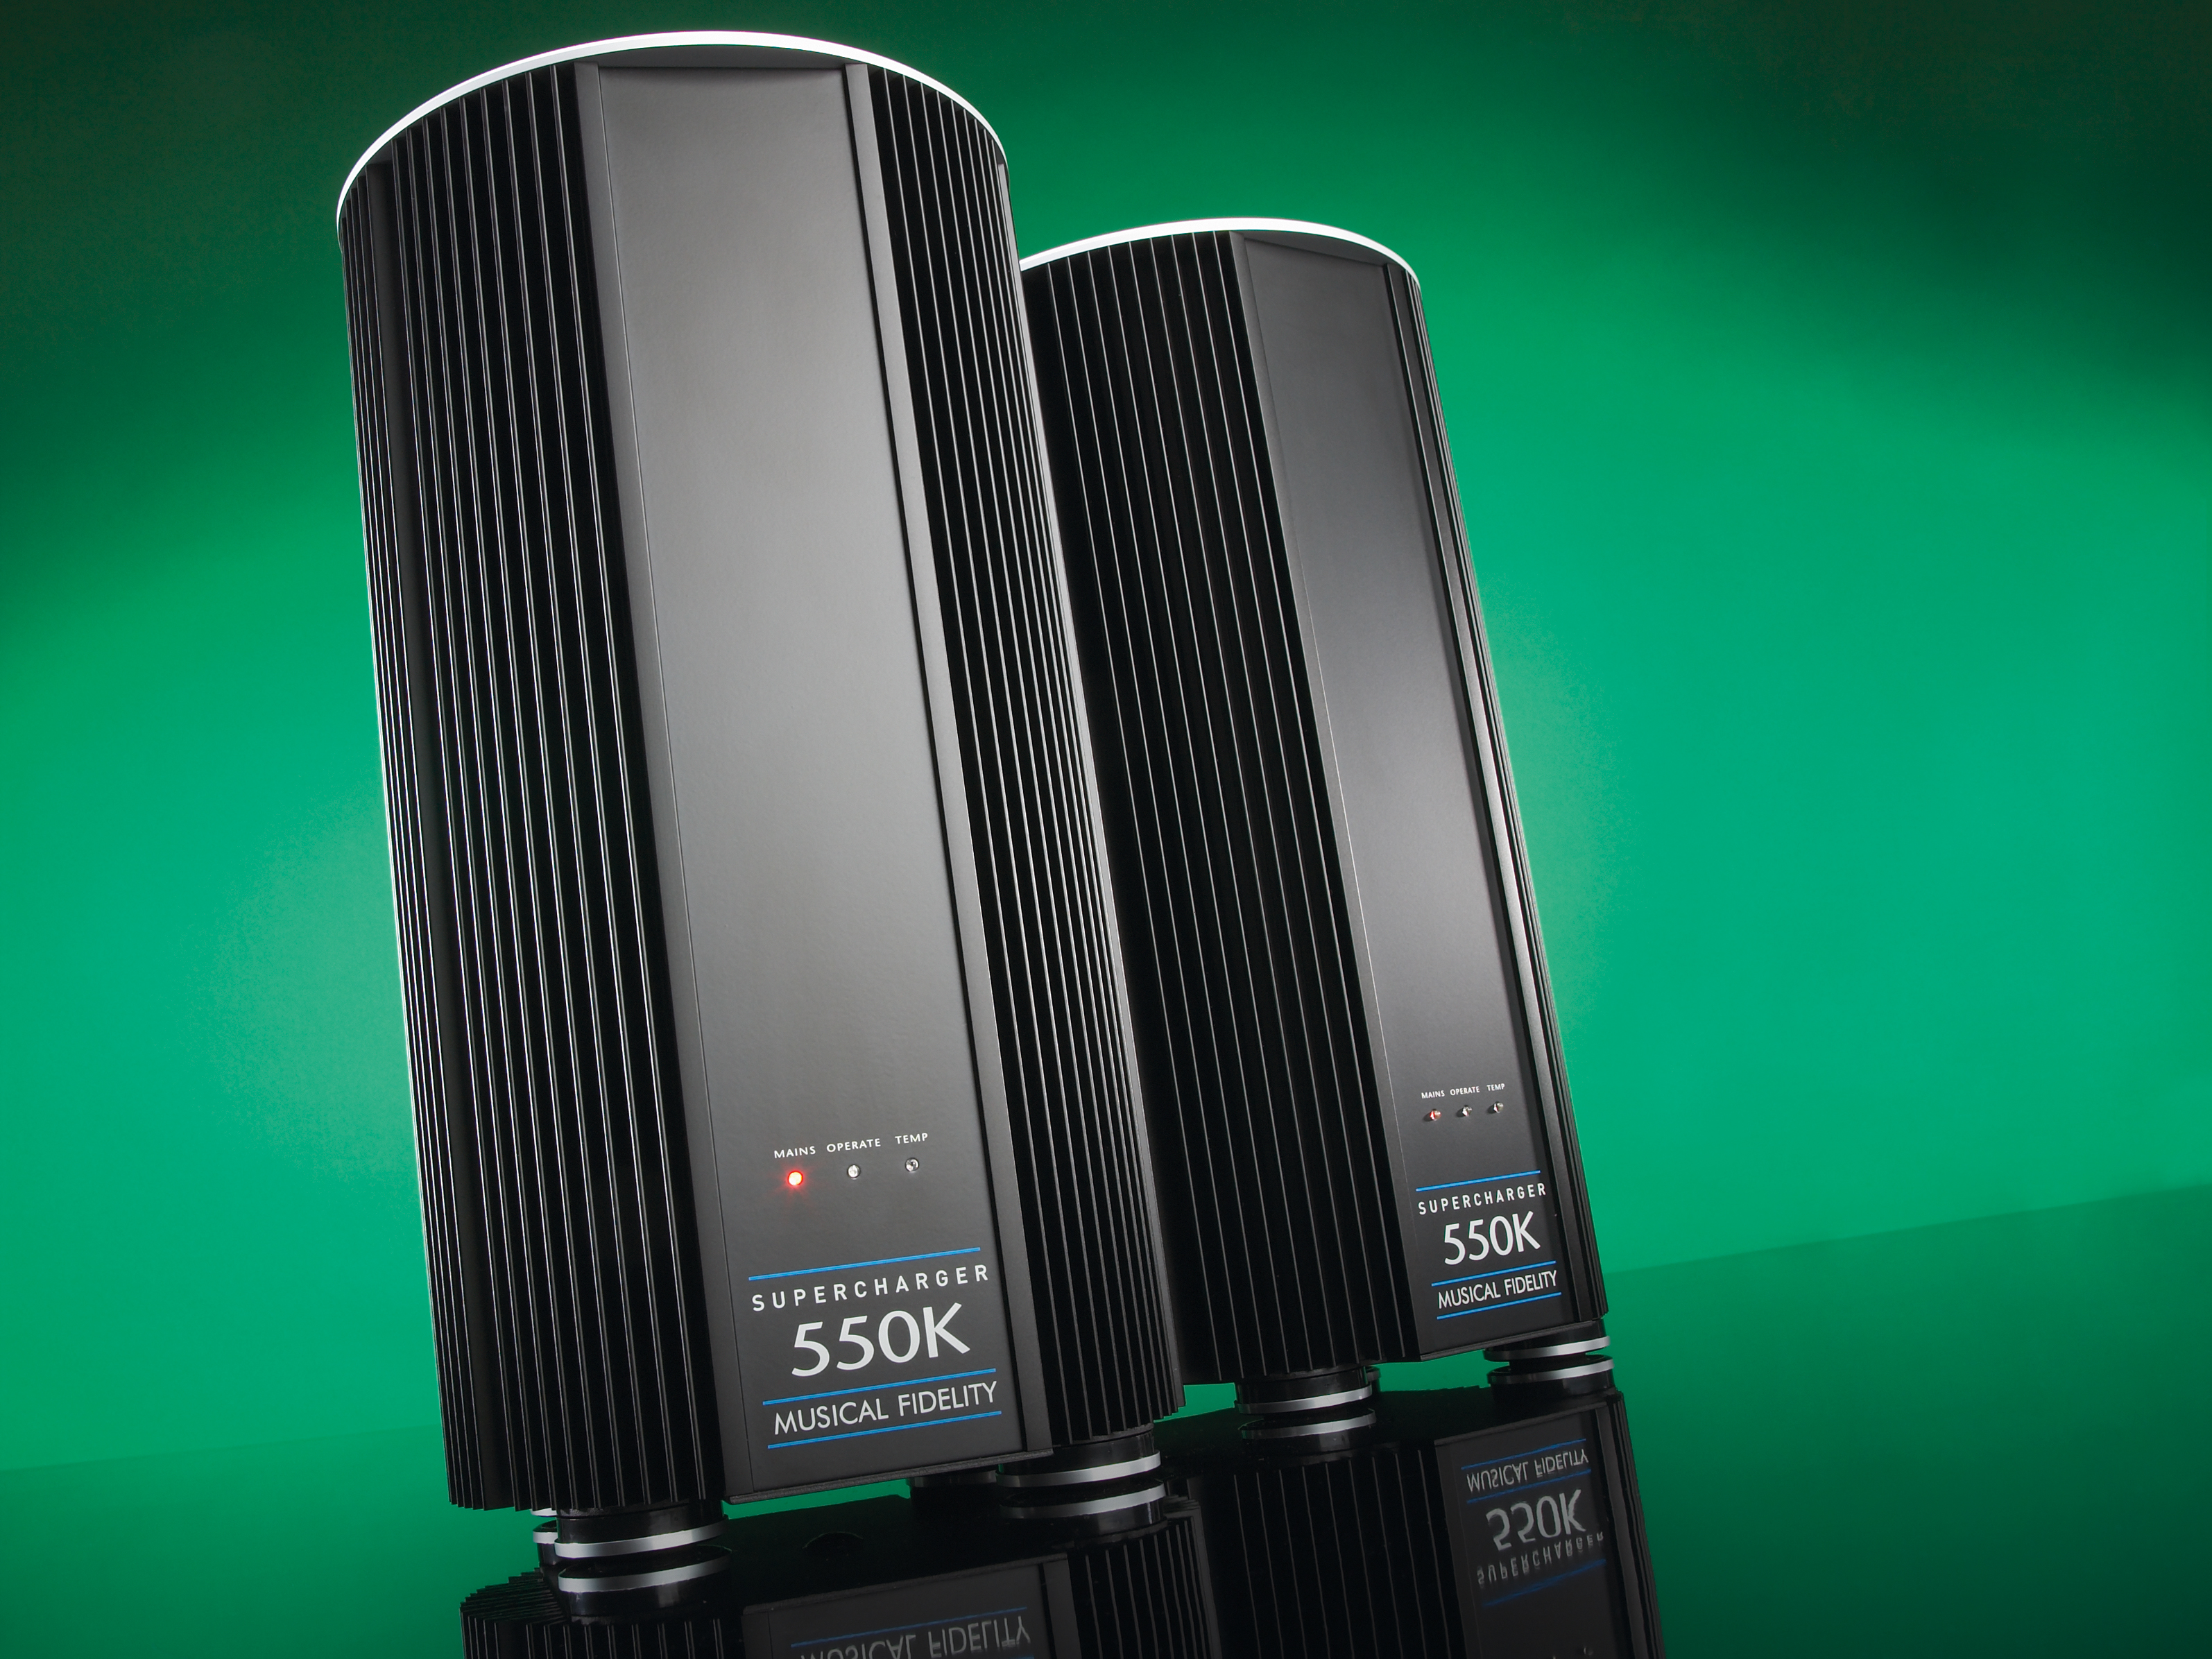 Musical Fidelity 550K Supercharger | TechRadar